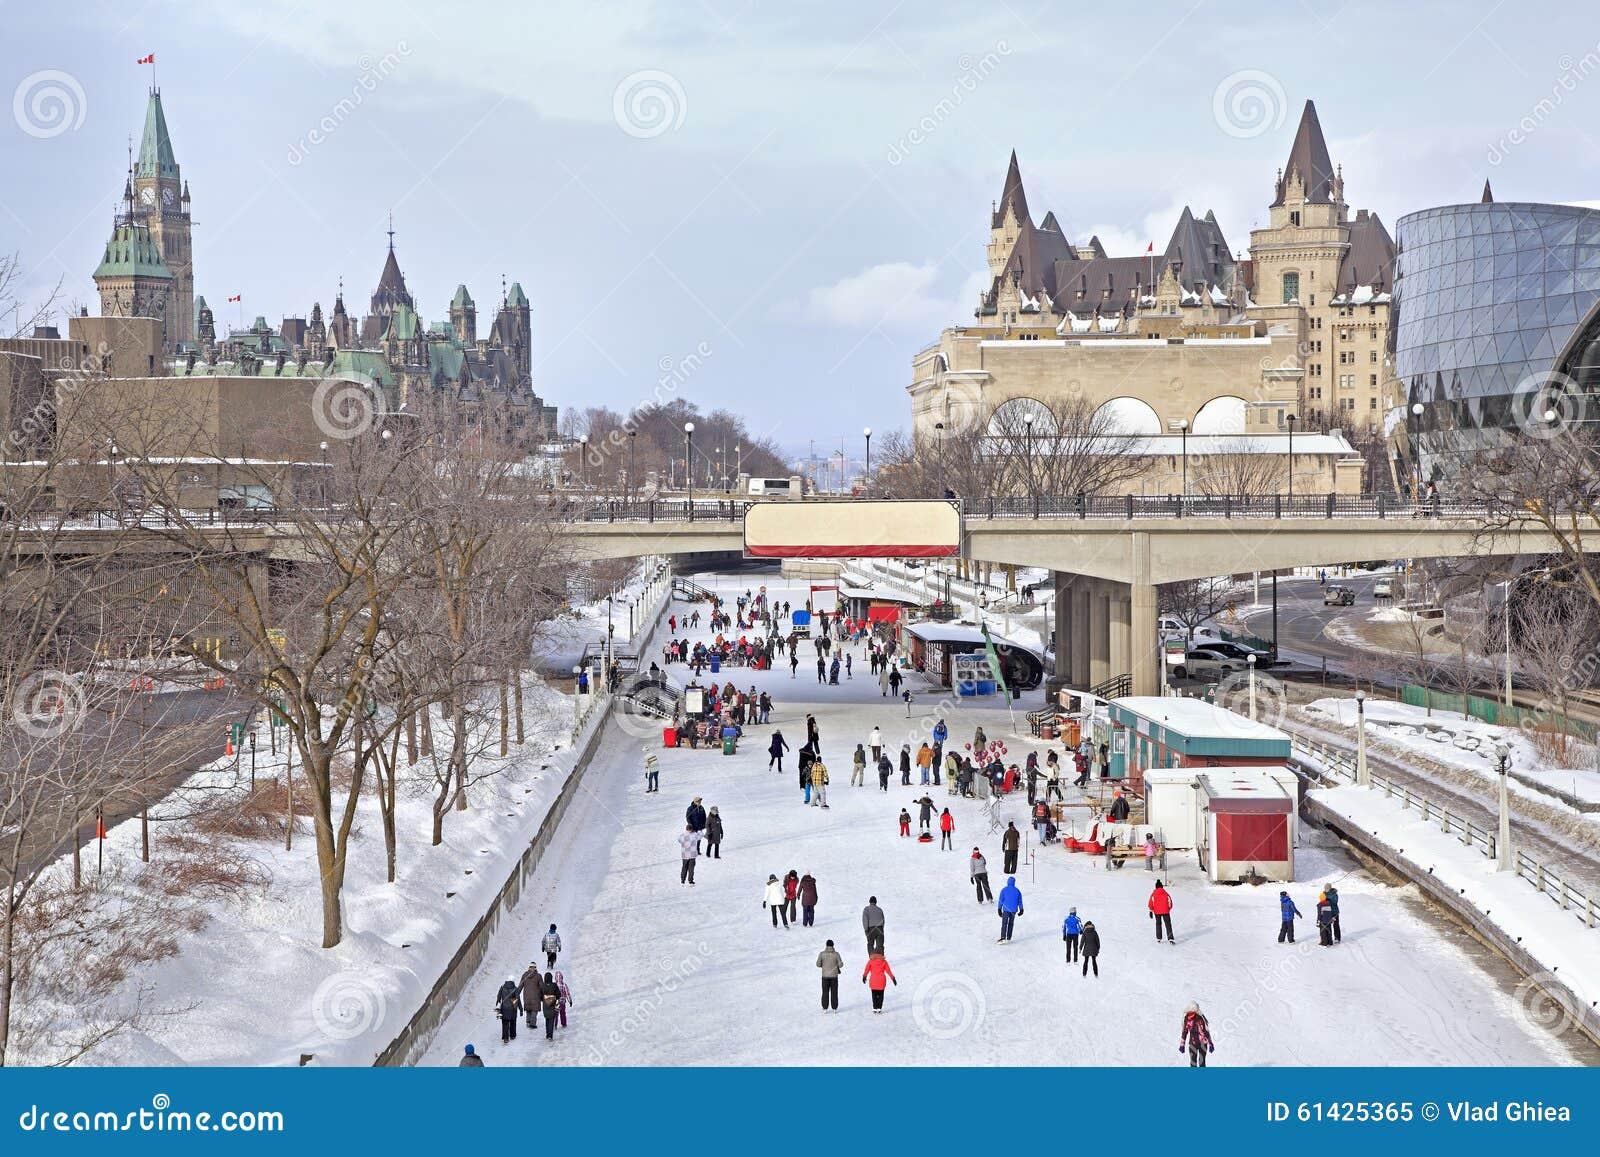 Rideau Canal skating rink in winter, Ottawa